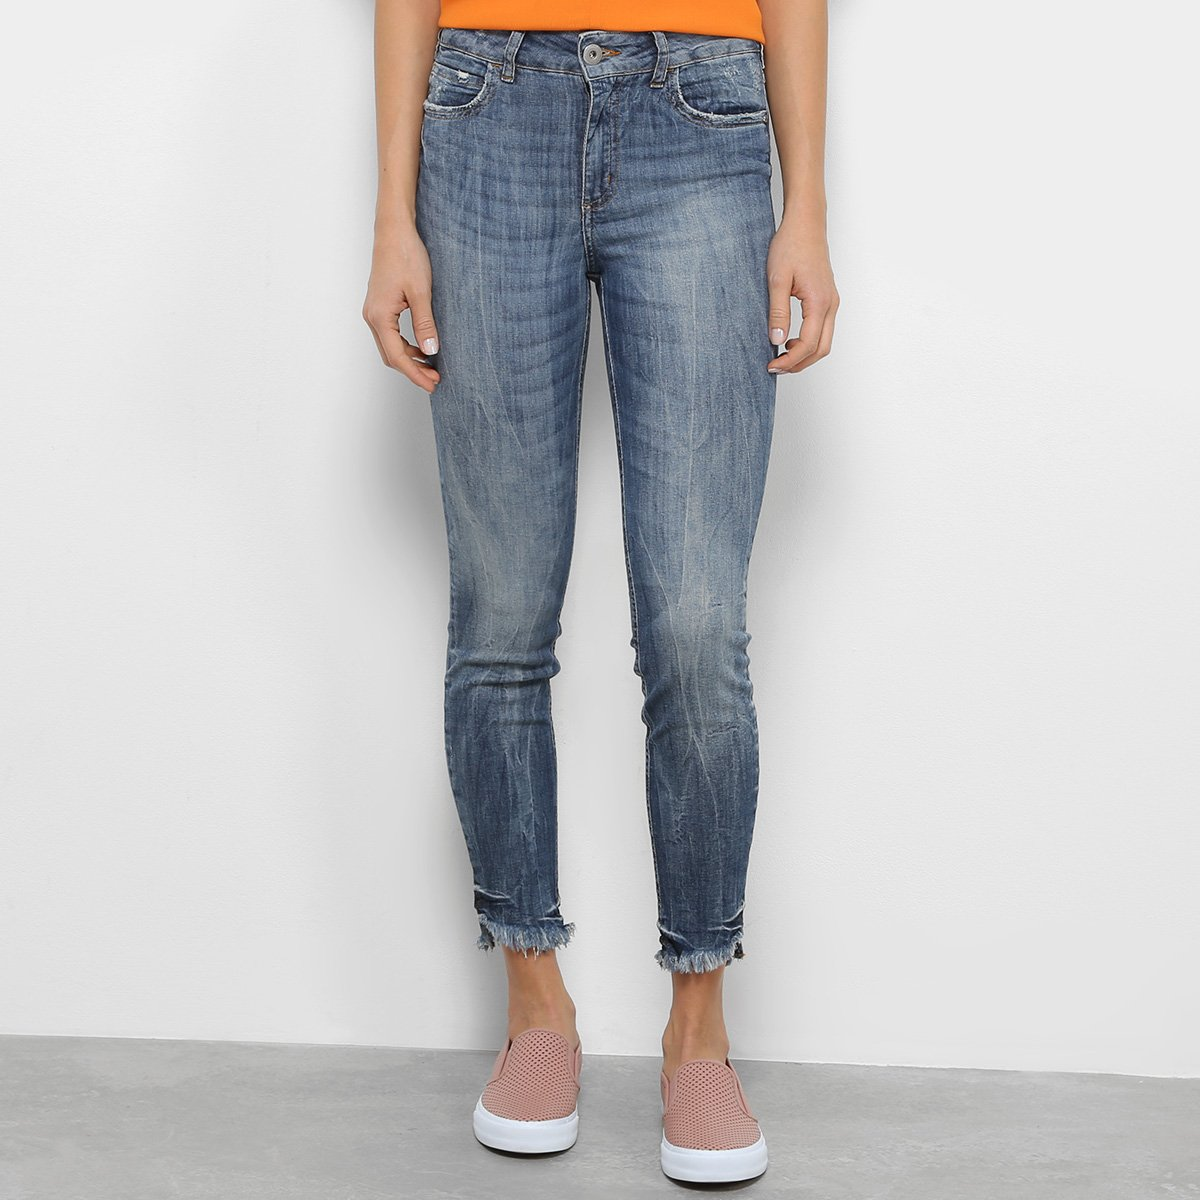 Calça Jeans Skinny Colcci Bia Estonada Feminina